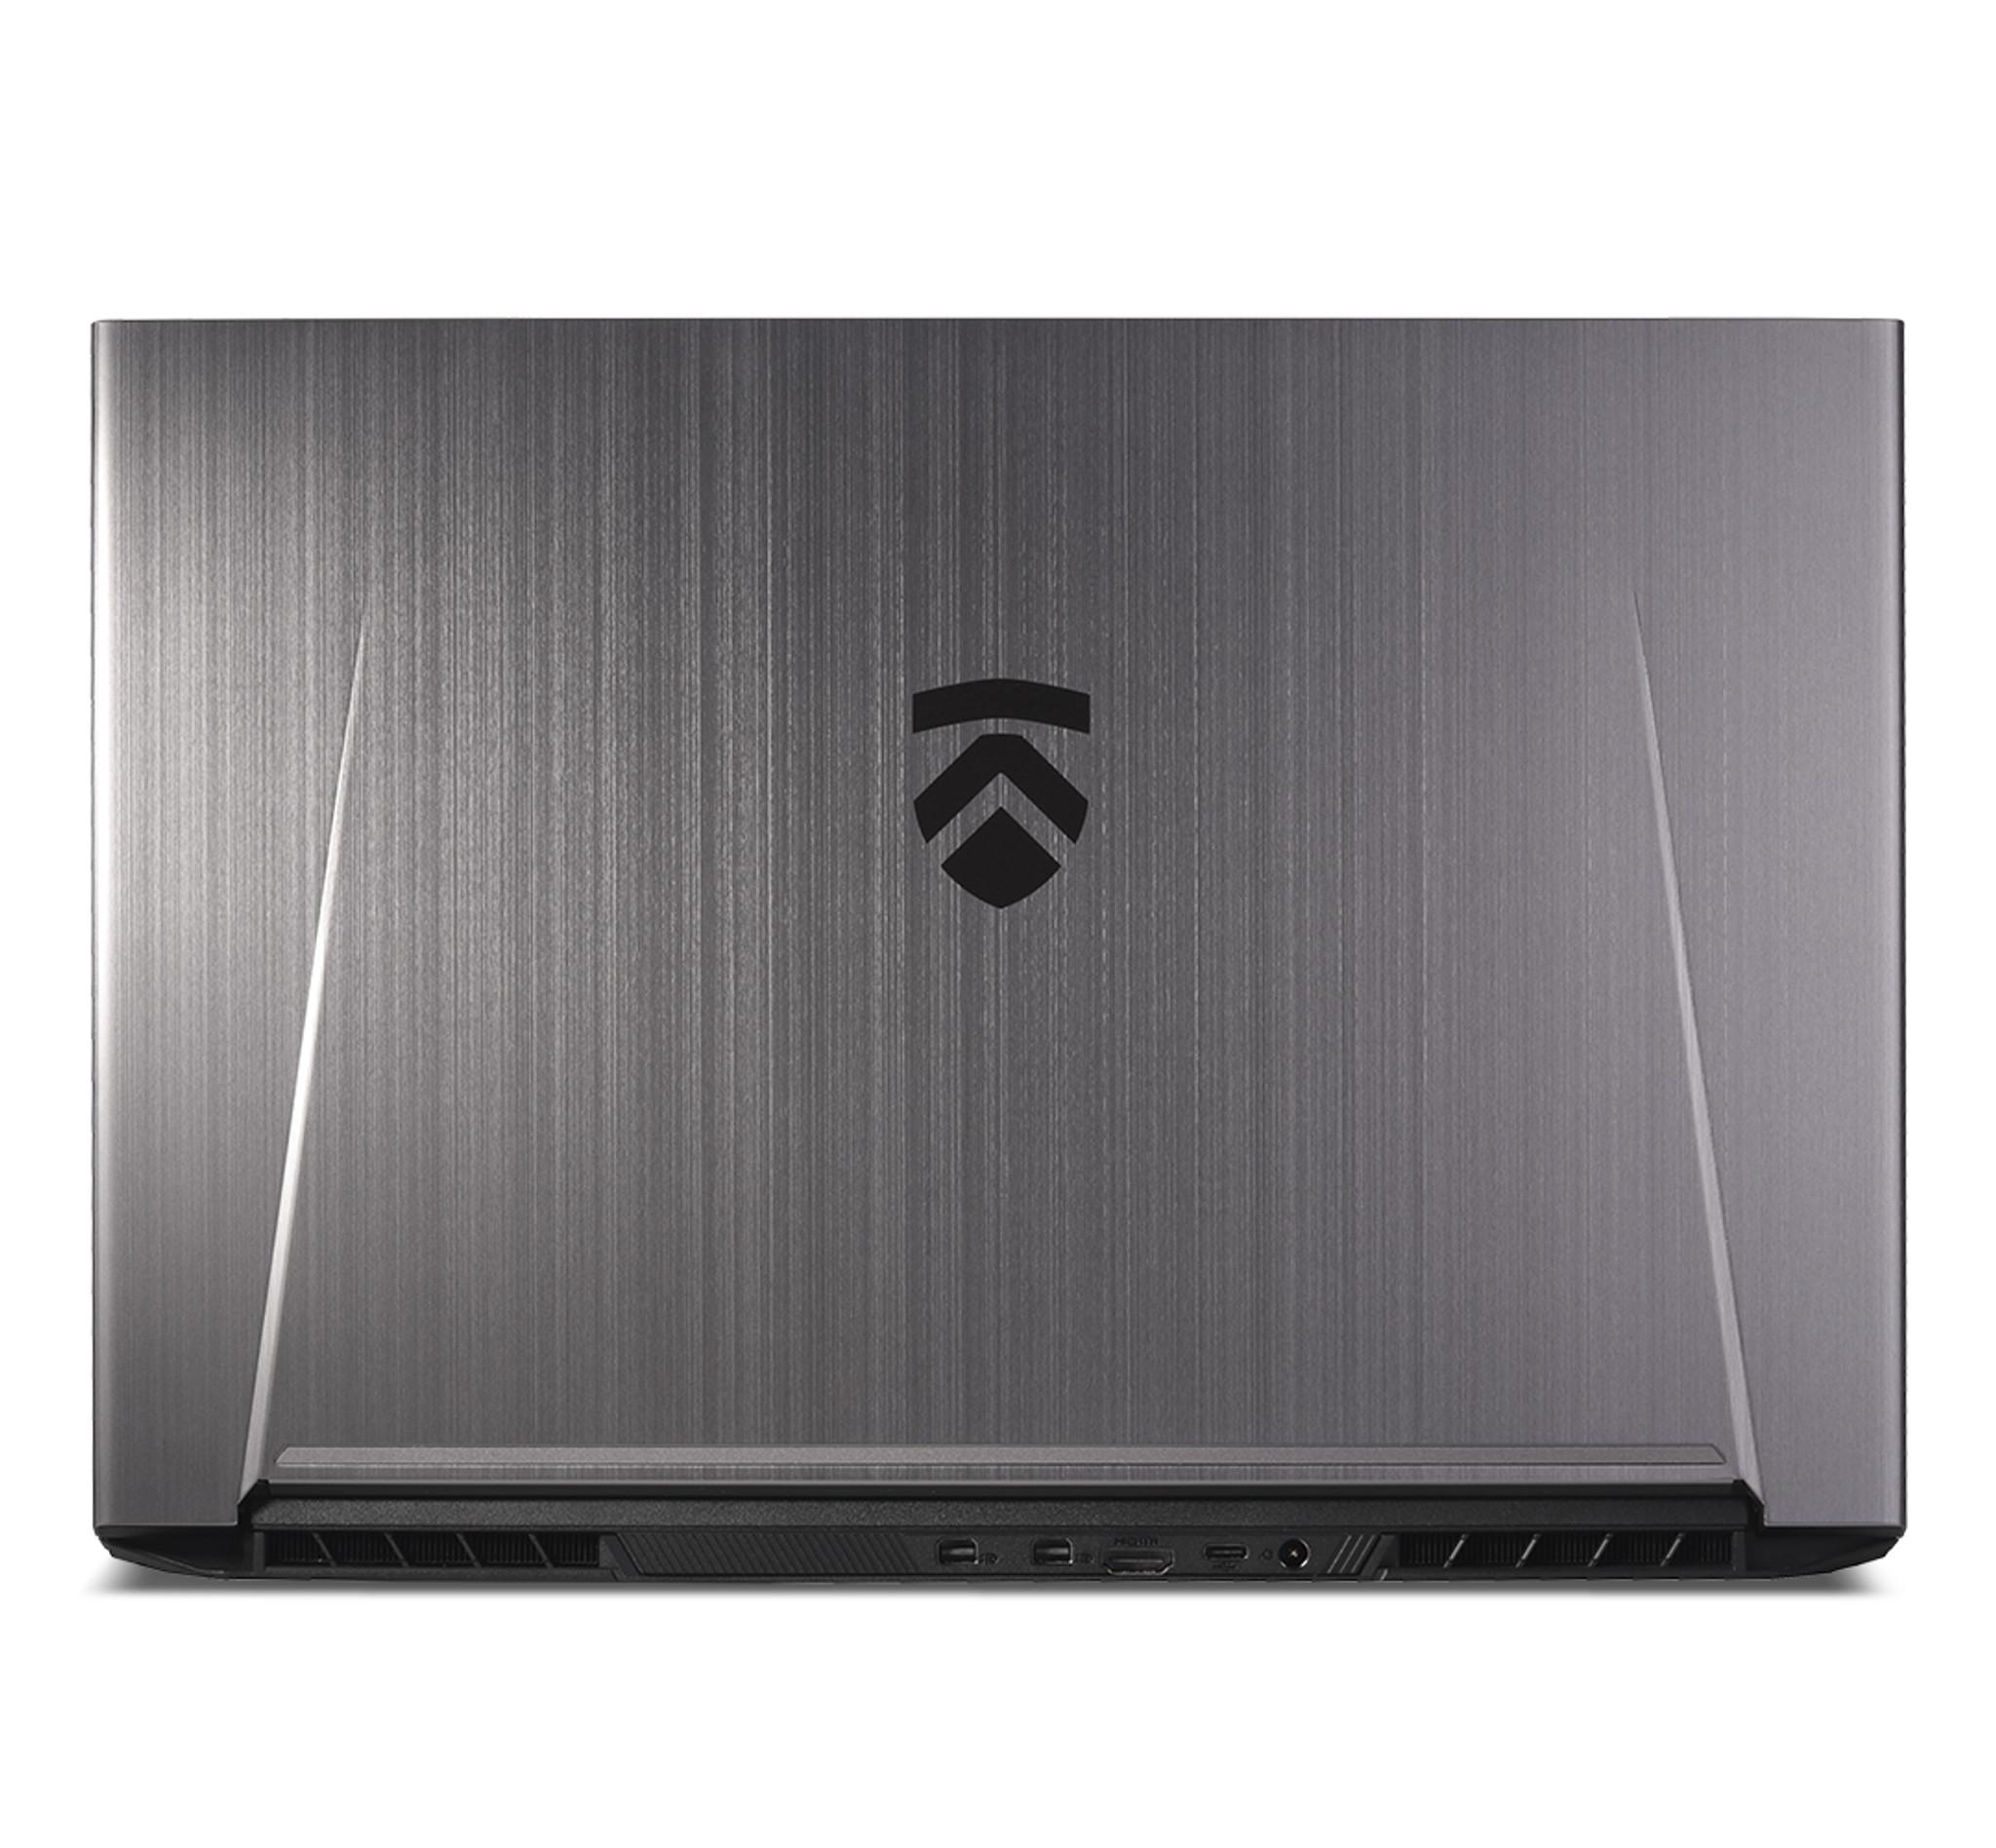 Eluktronics MECH-15 G2 Slim & Light Series 15 6-Inch Premium Gaming Laptop  with per-key RGB Mechanical Keyboard (Up to NVIDIA® GeForce® RTX 2070